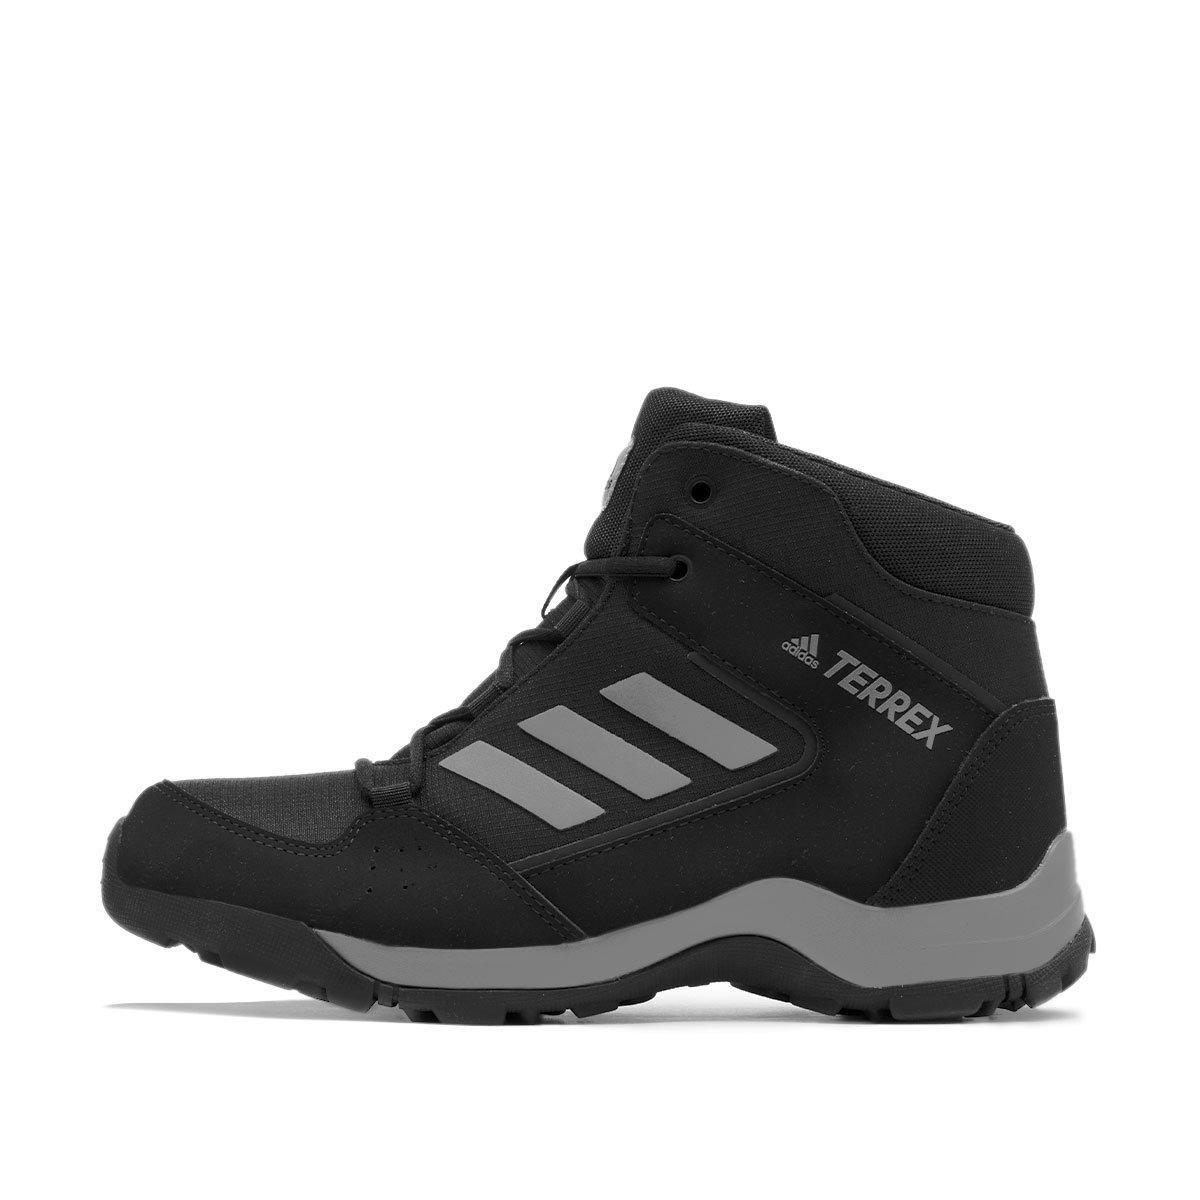 Adidas Terrex HyperHiker